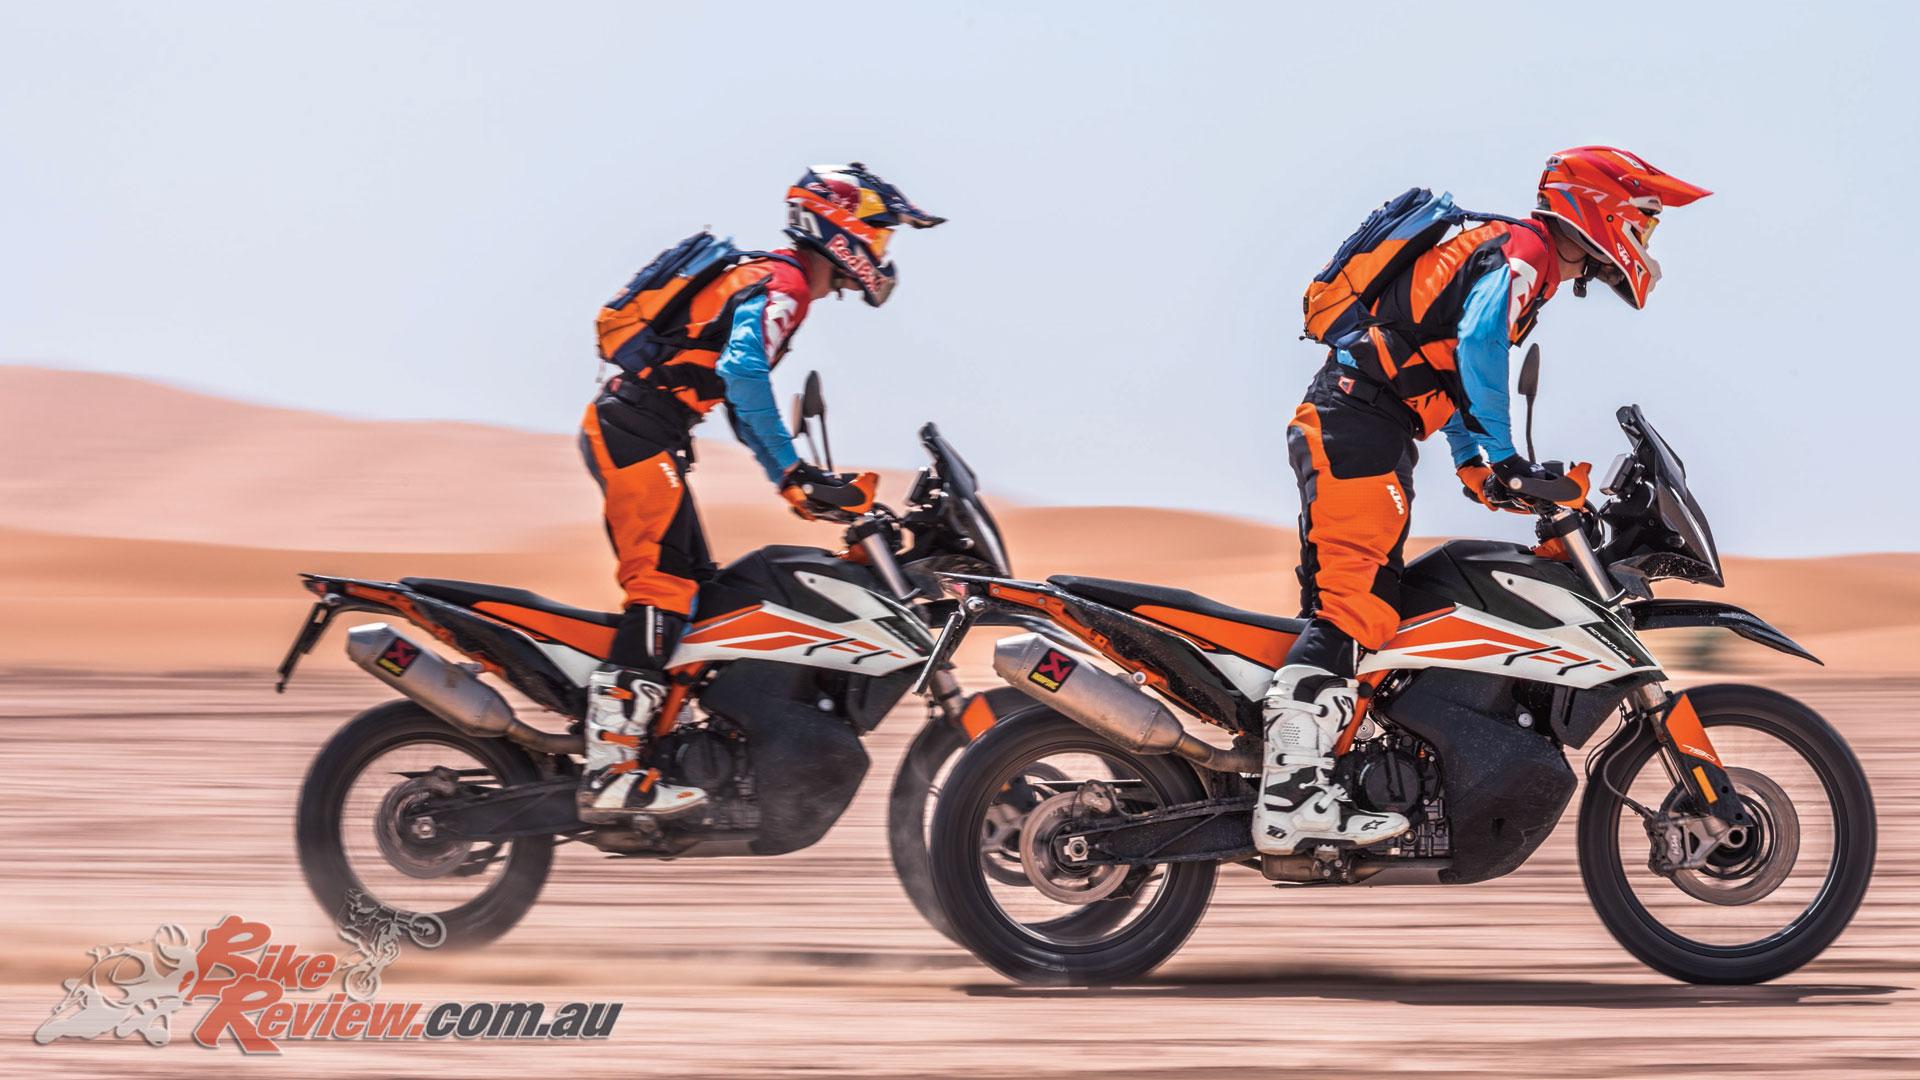 2019 KTM Adventure 790 R